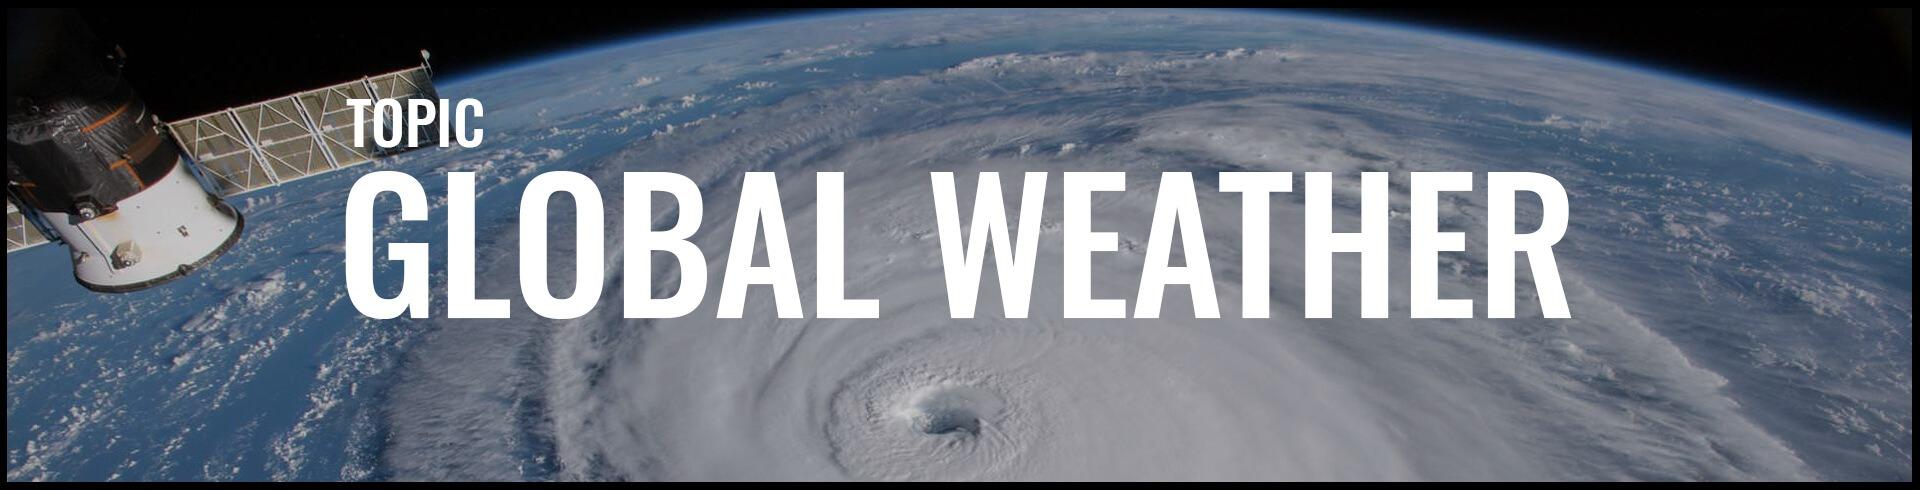 Global-Weather-Great-Awakening-Report